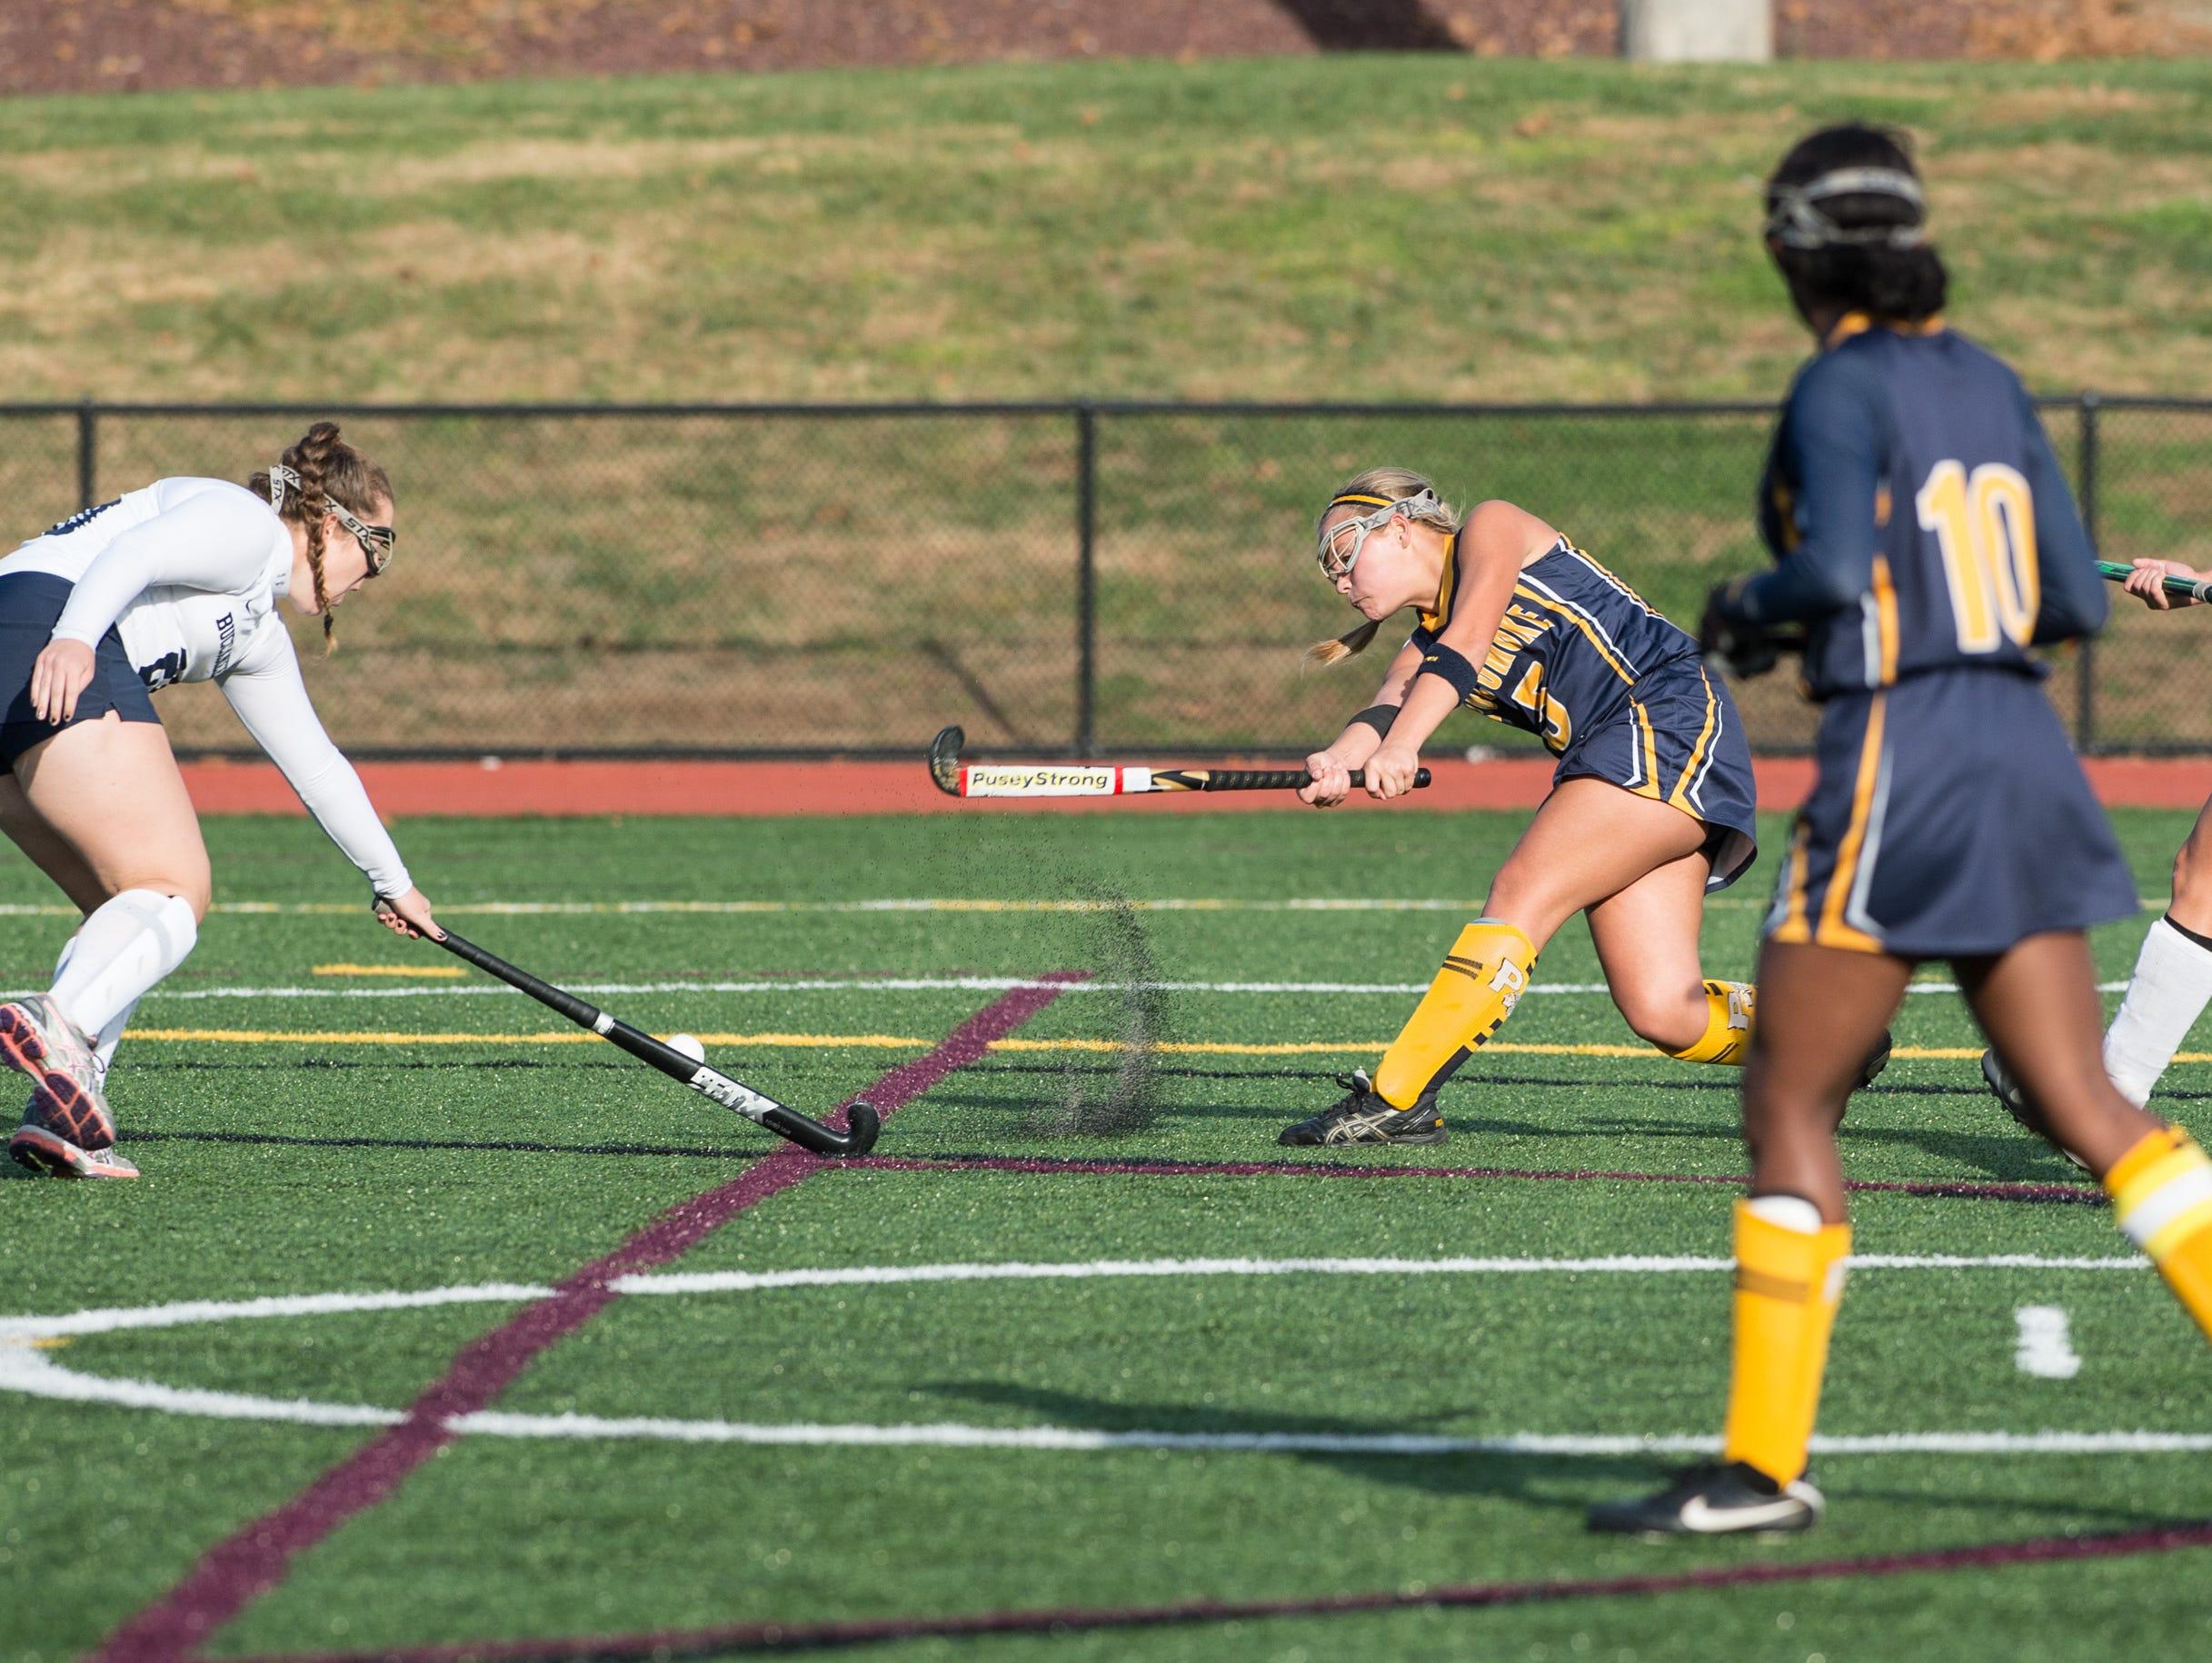 Pocomoke's McKenzie Mitchell takes a shot on goal.